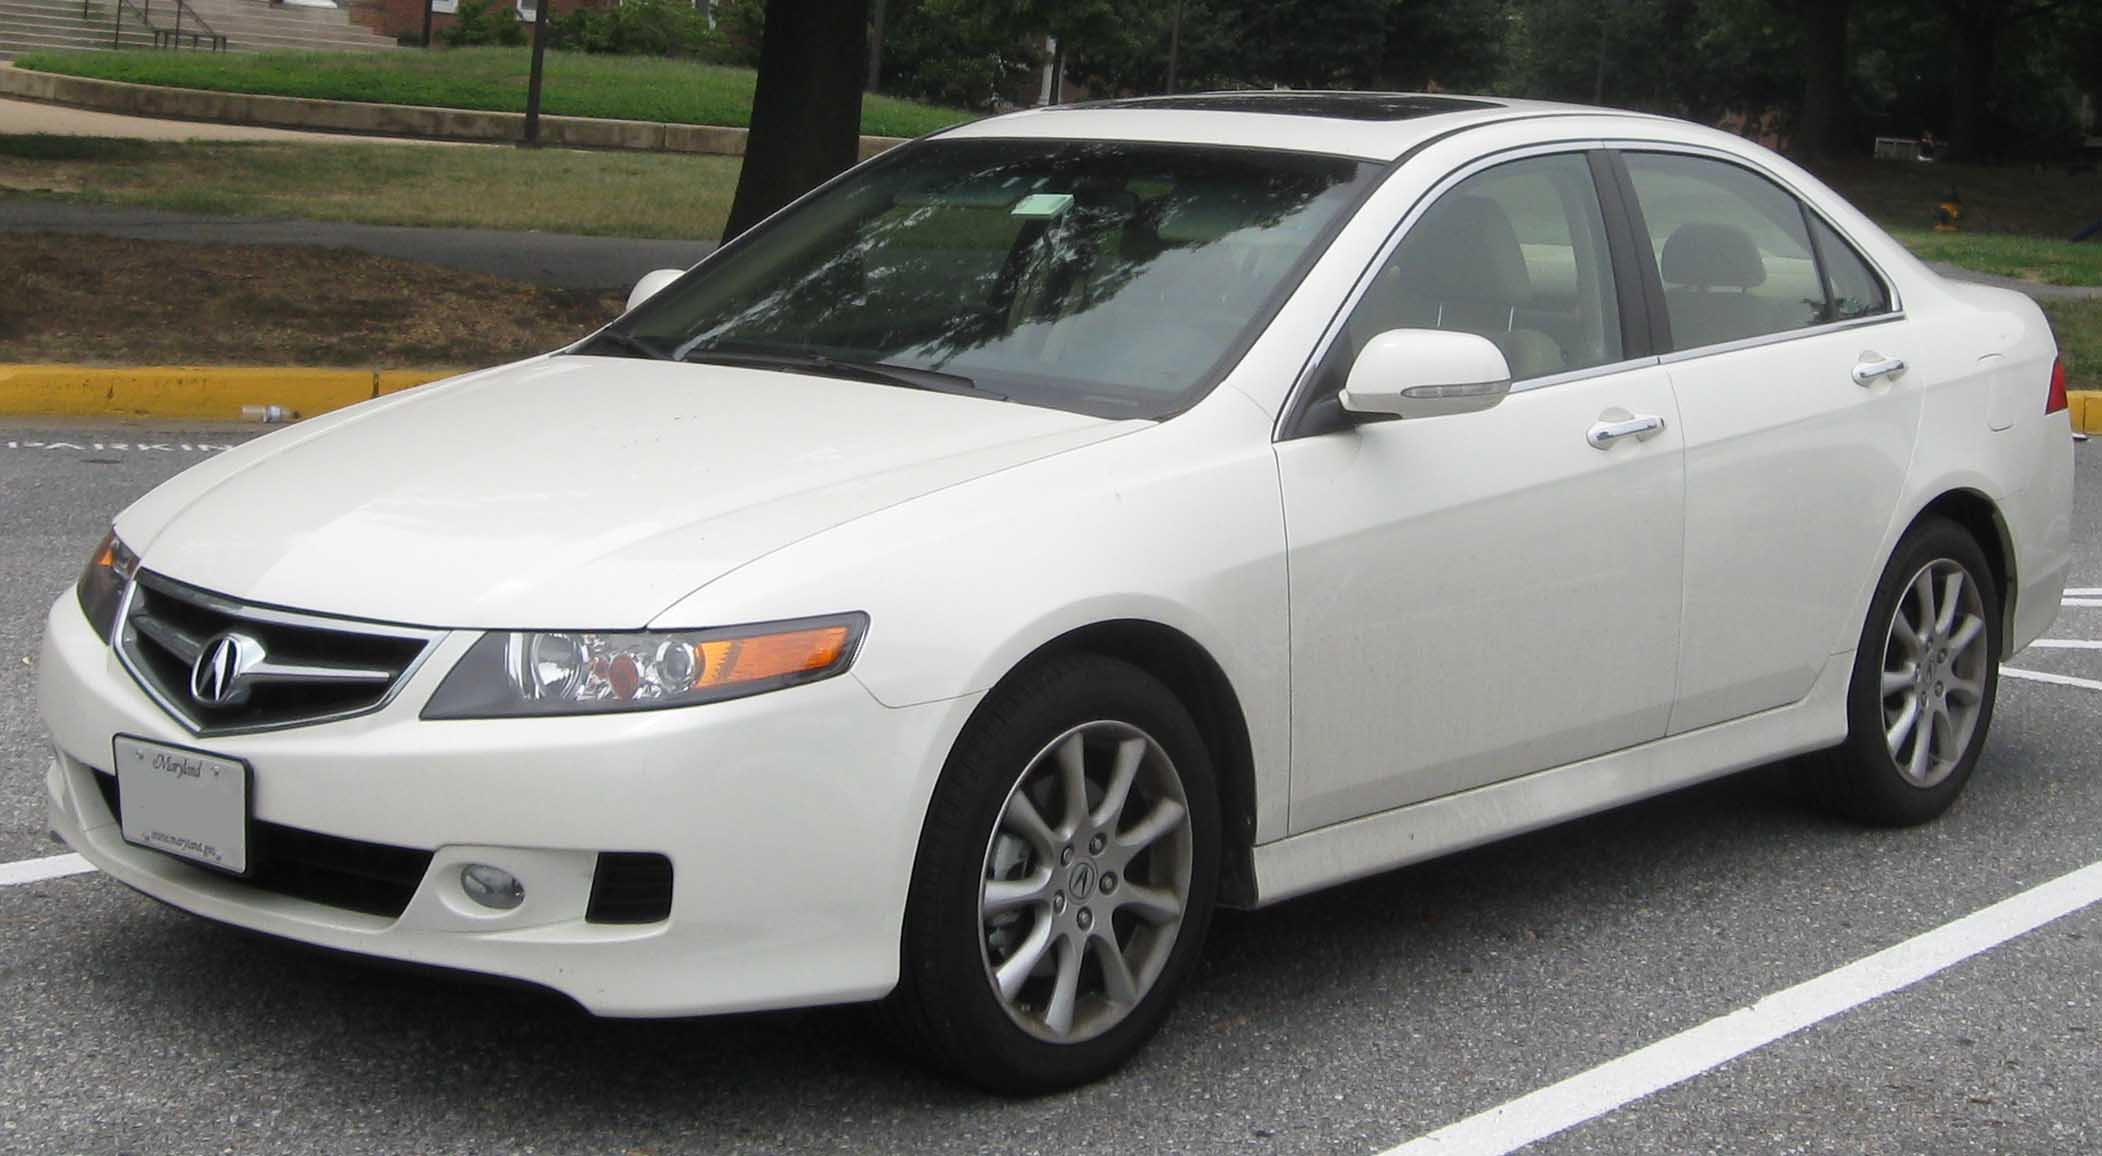 Used Honda Car For Sale Olx Jnb Sa